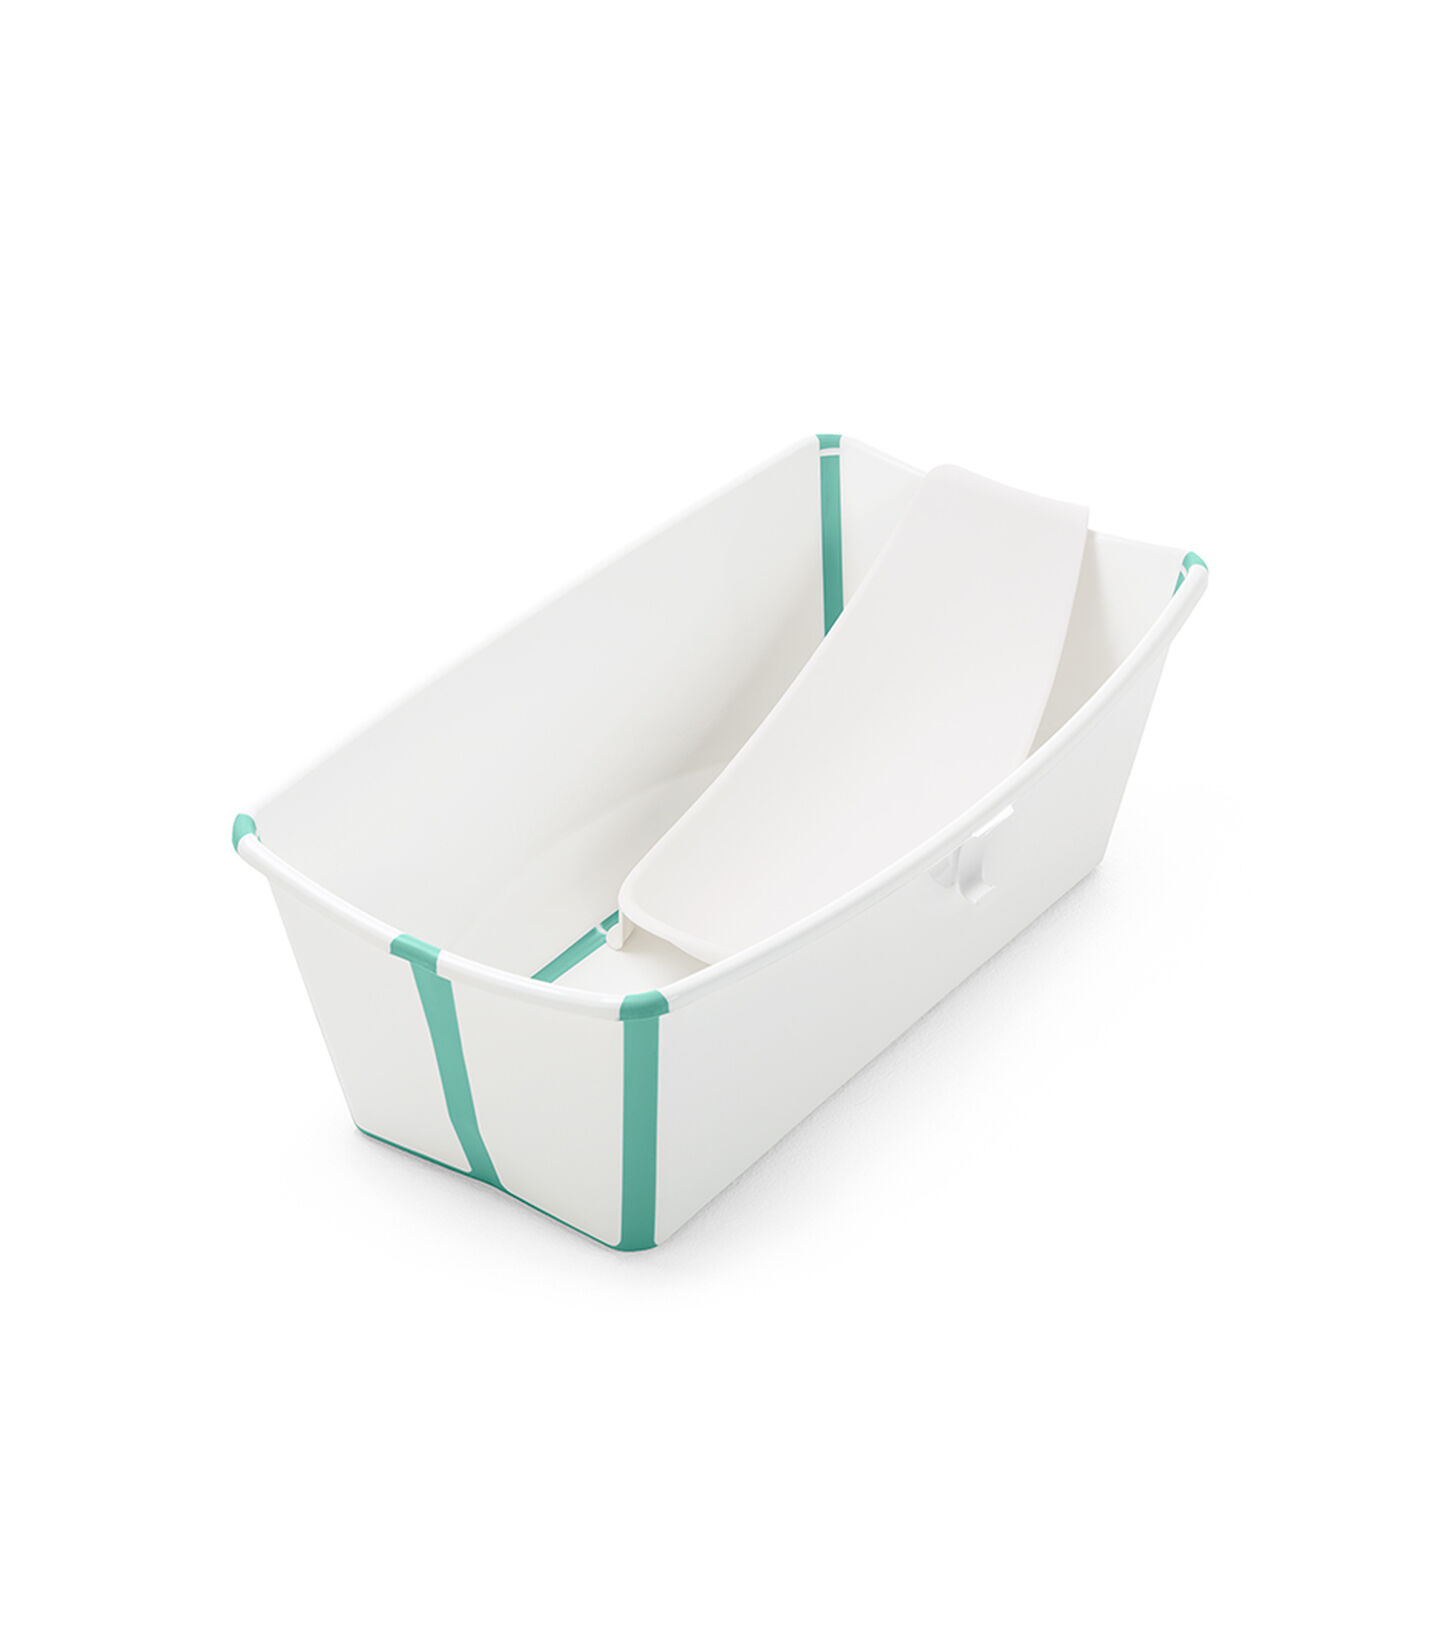 Stokke® Flexi Bath® bath tub, White Aqua with Newborn insert. view 2